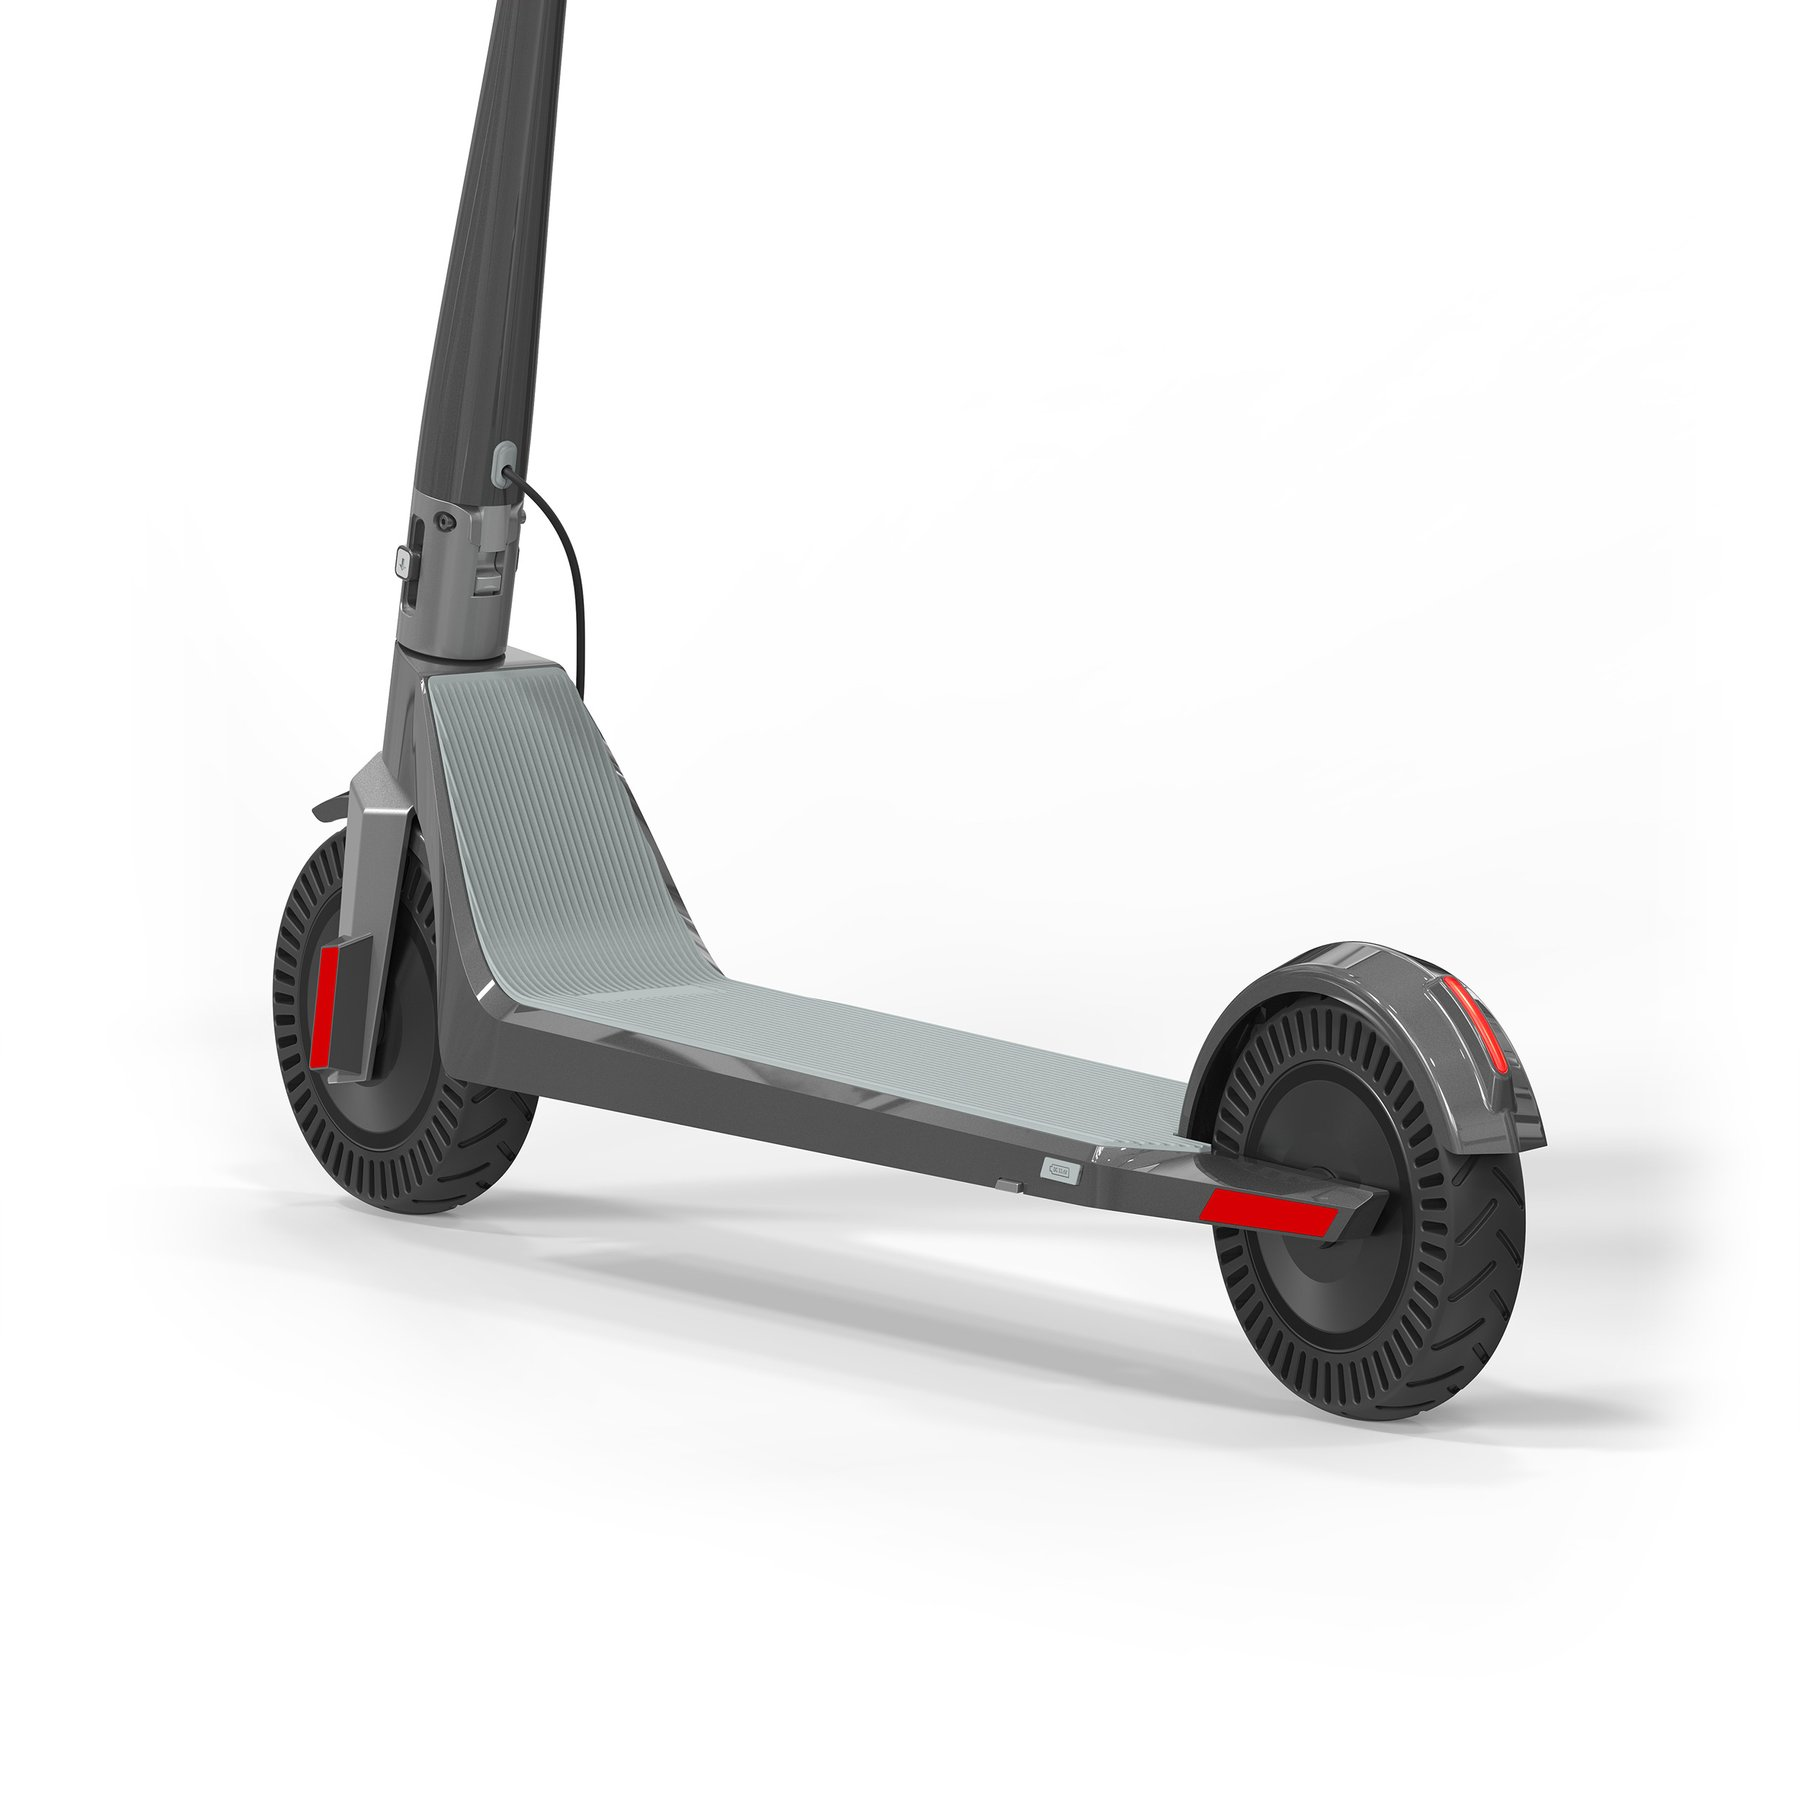 scooter_gotham_05.1_1800x1800.jpg